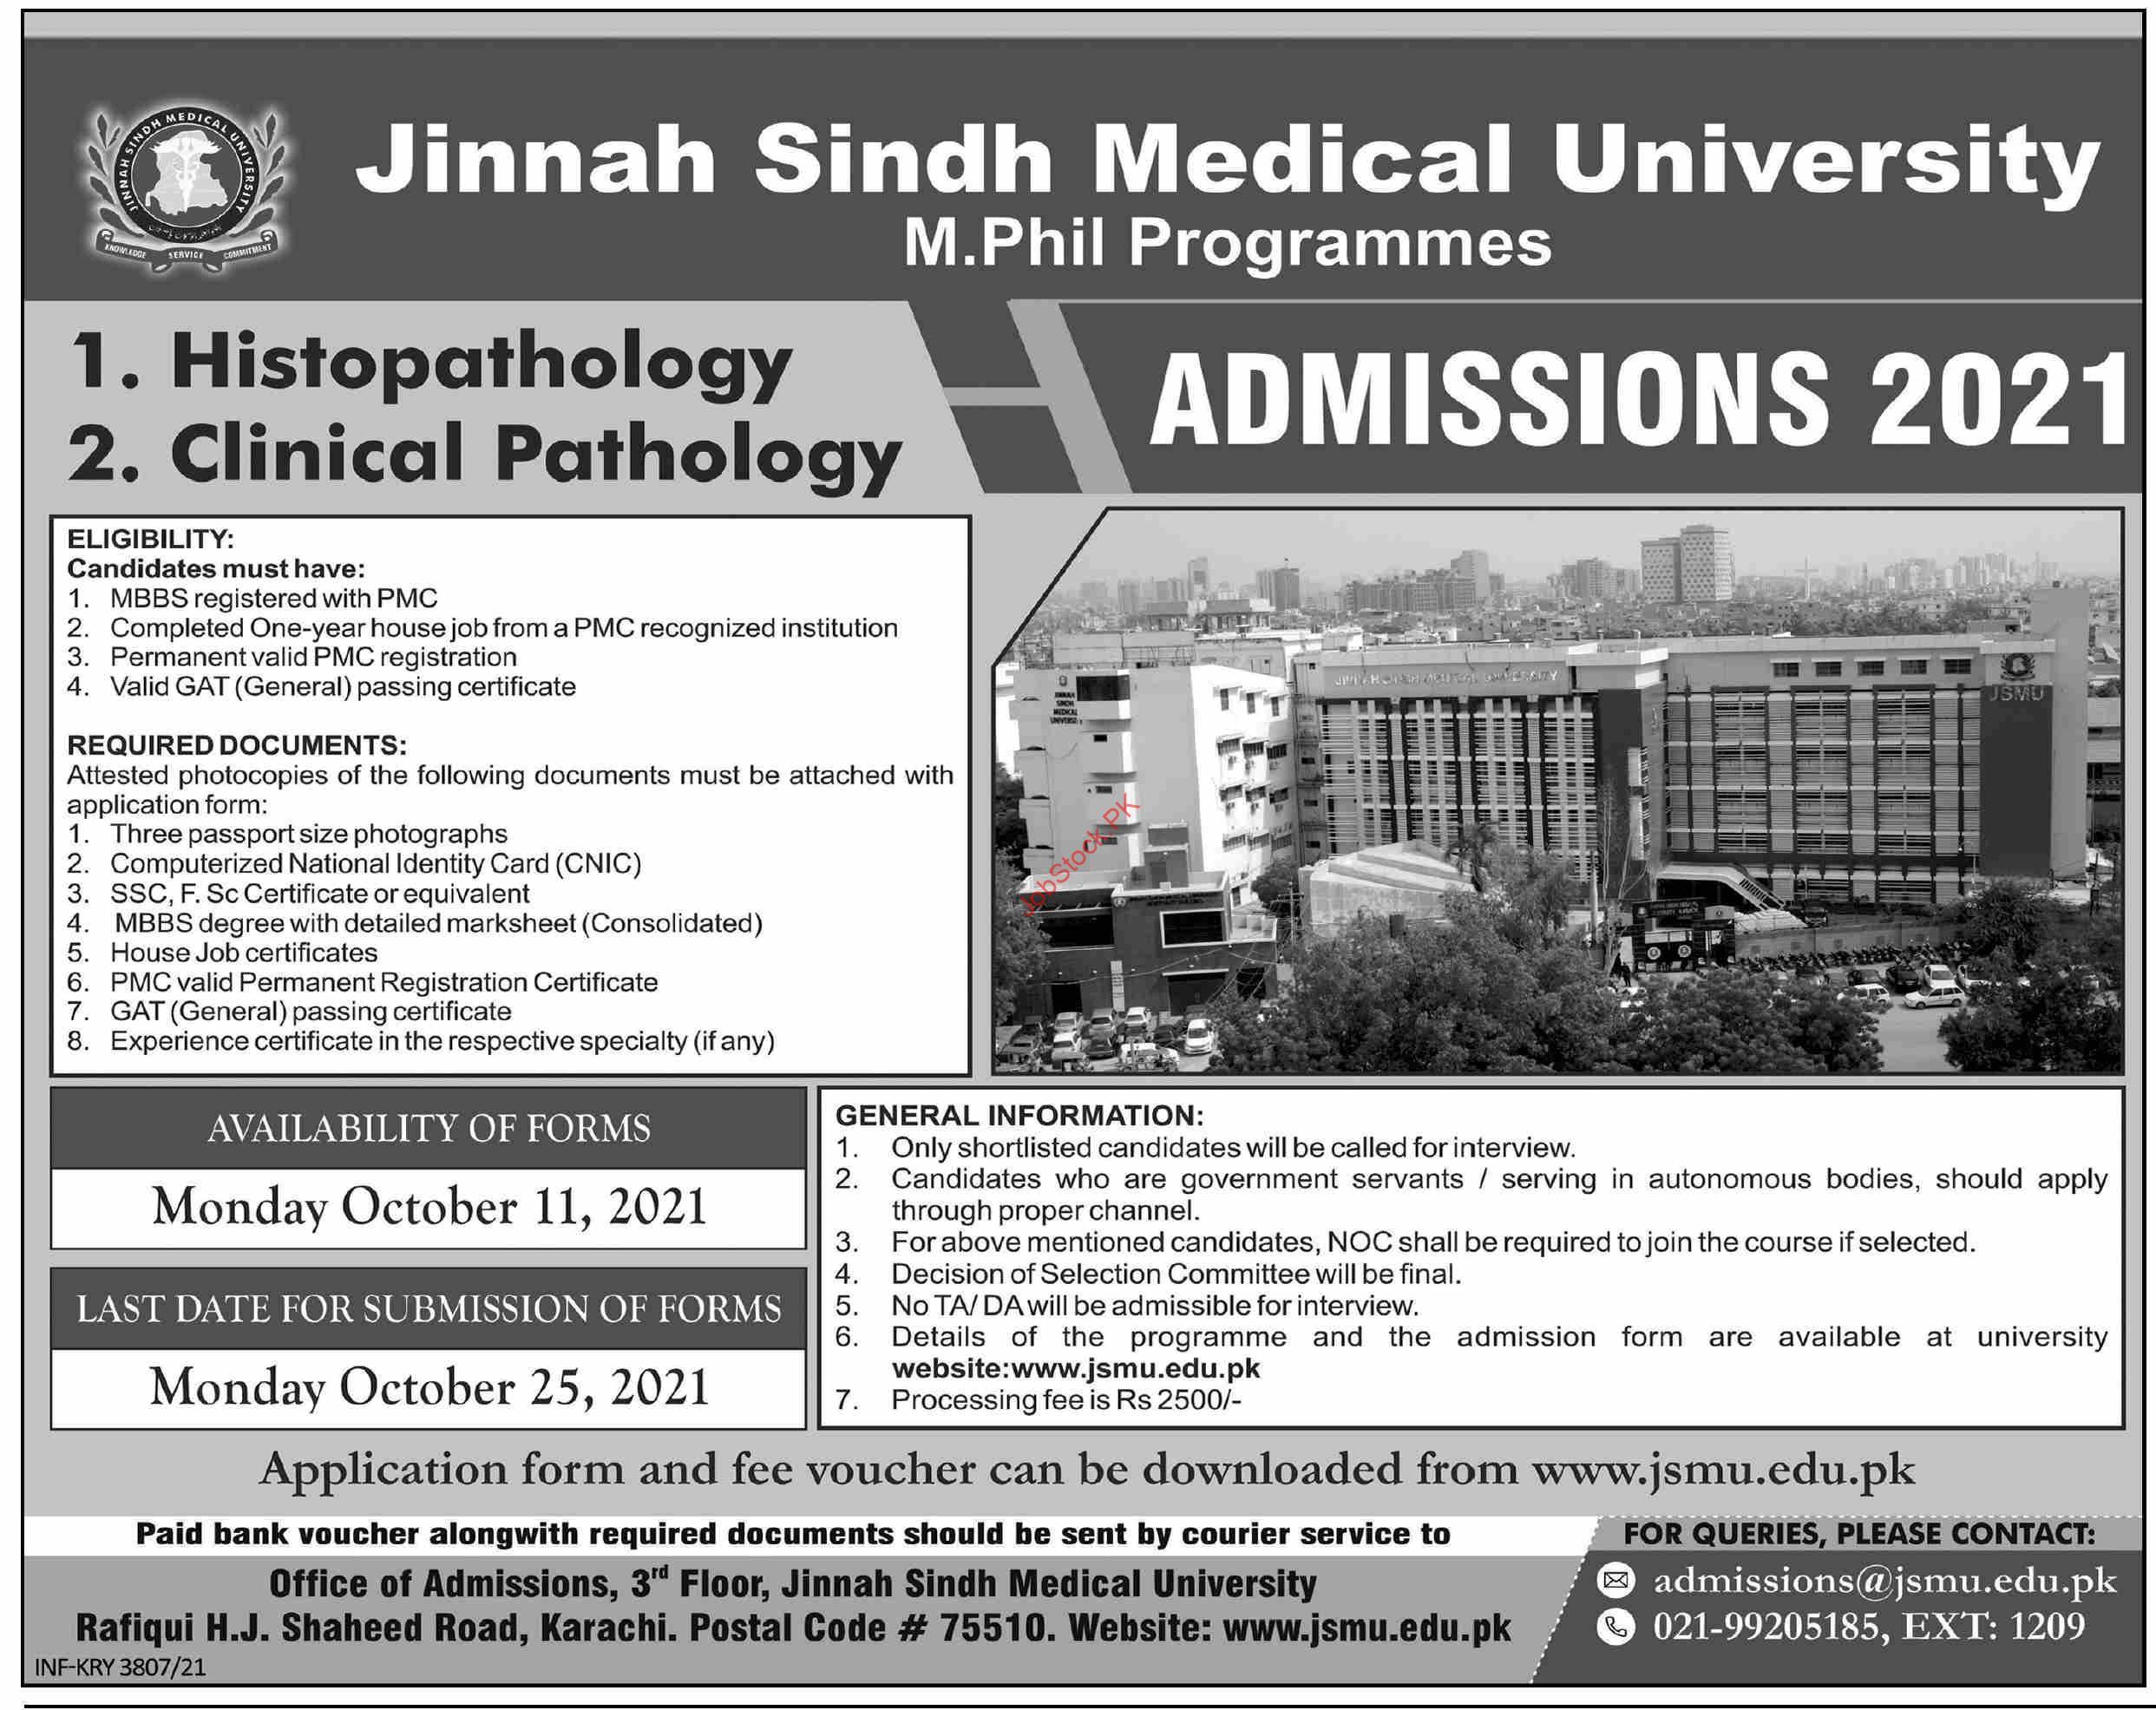 Jinnah Sindh Medical University Admission 2021 Advertisement October